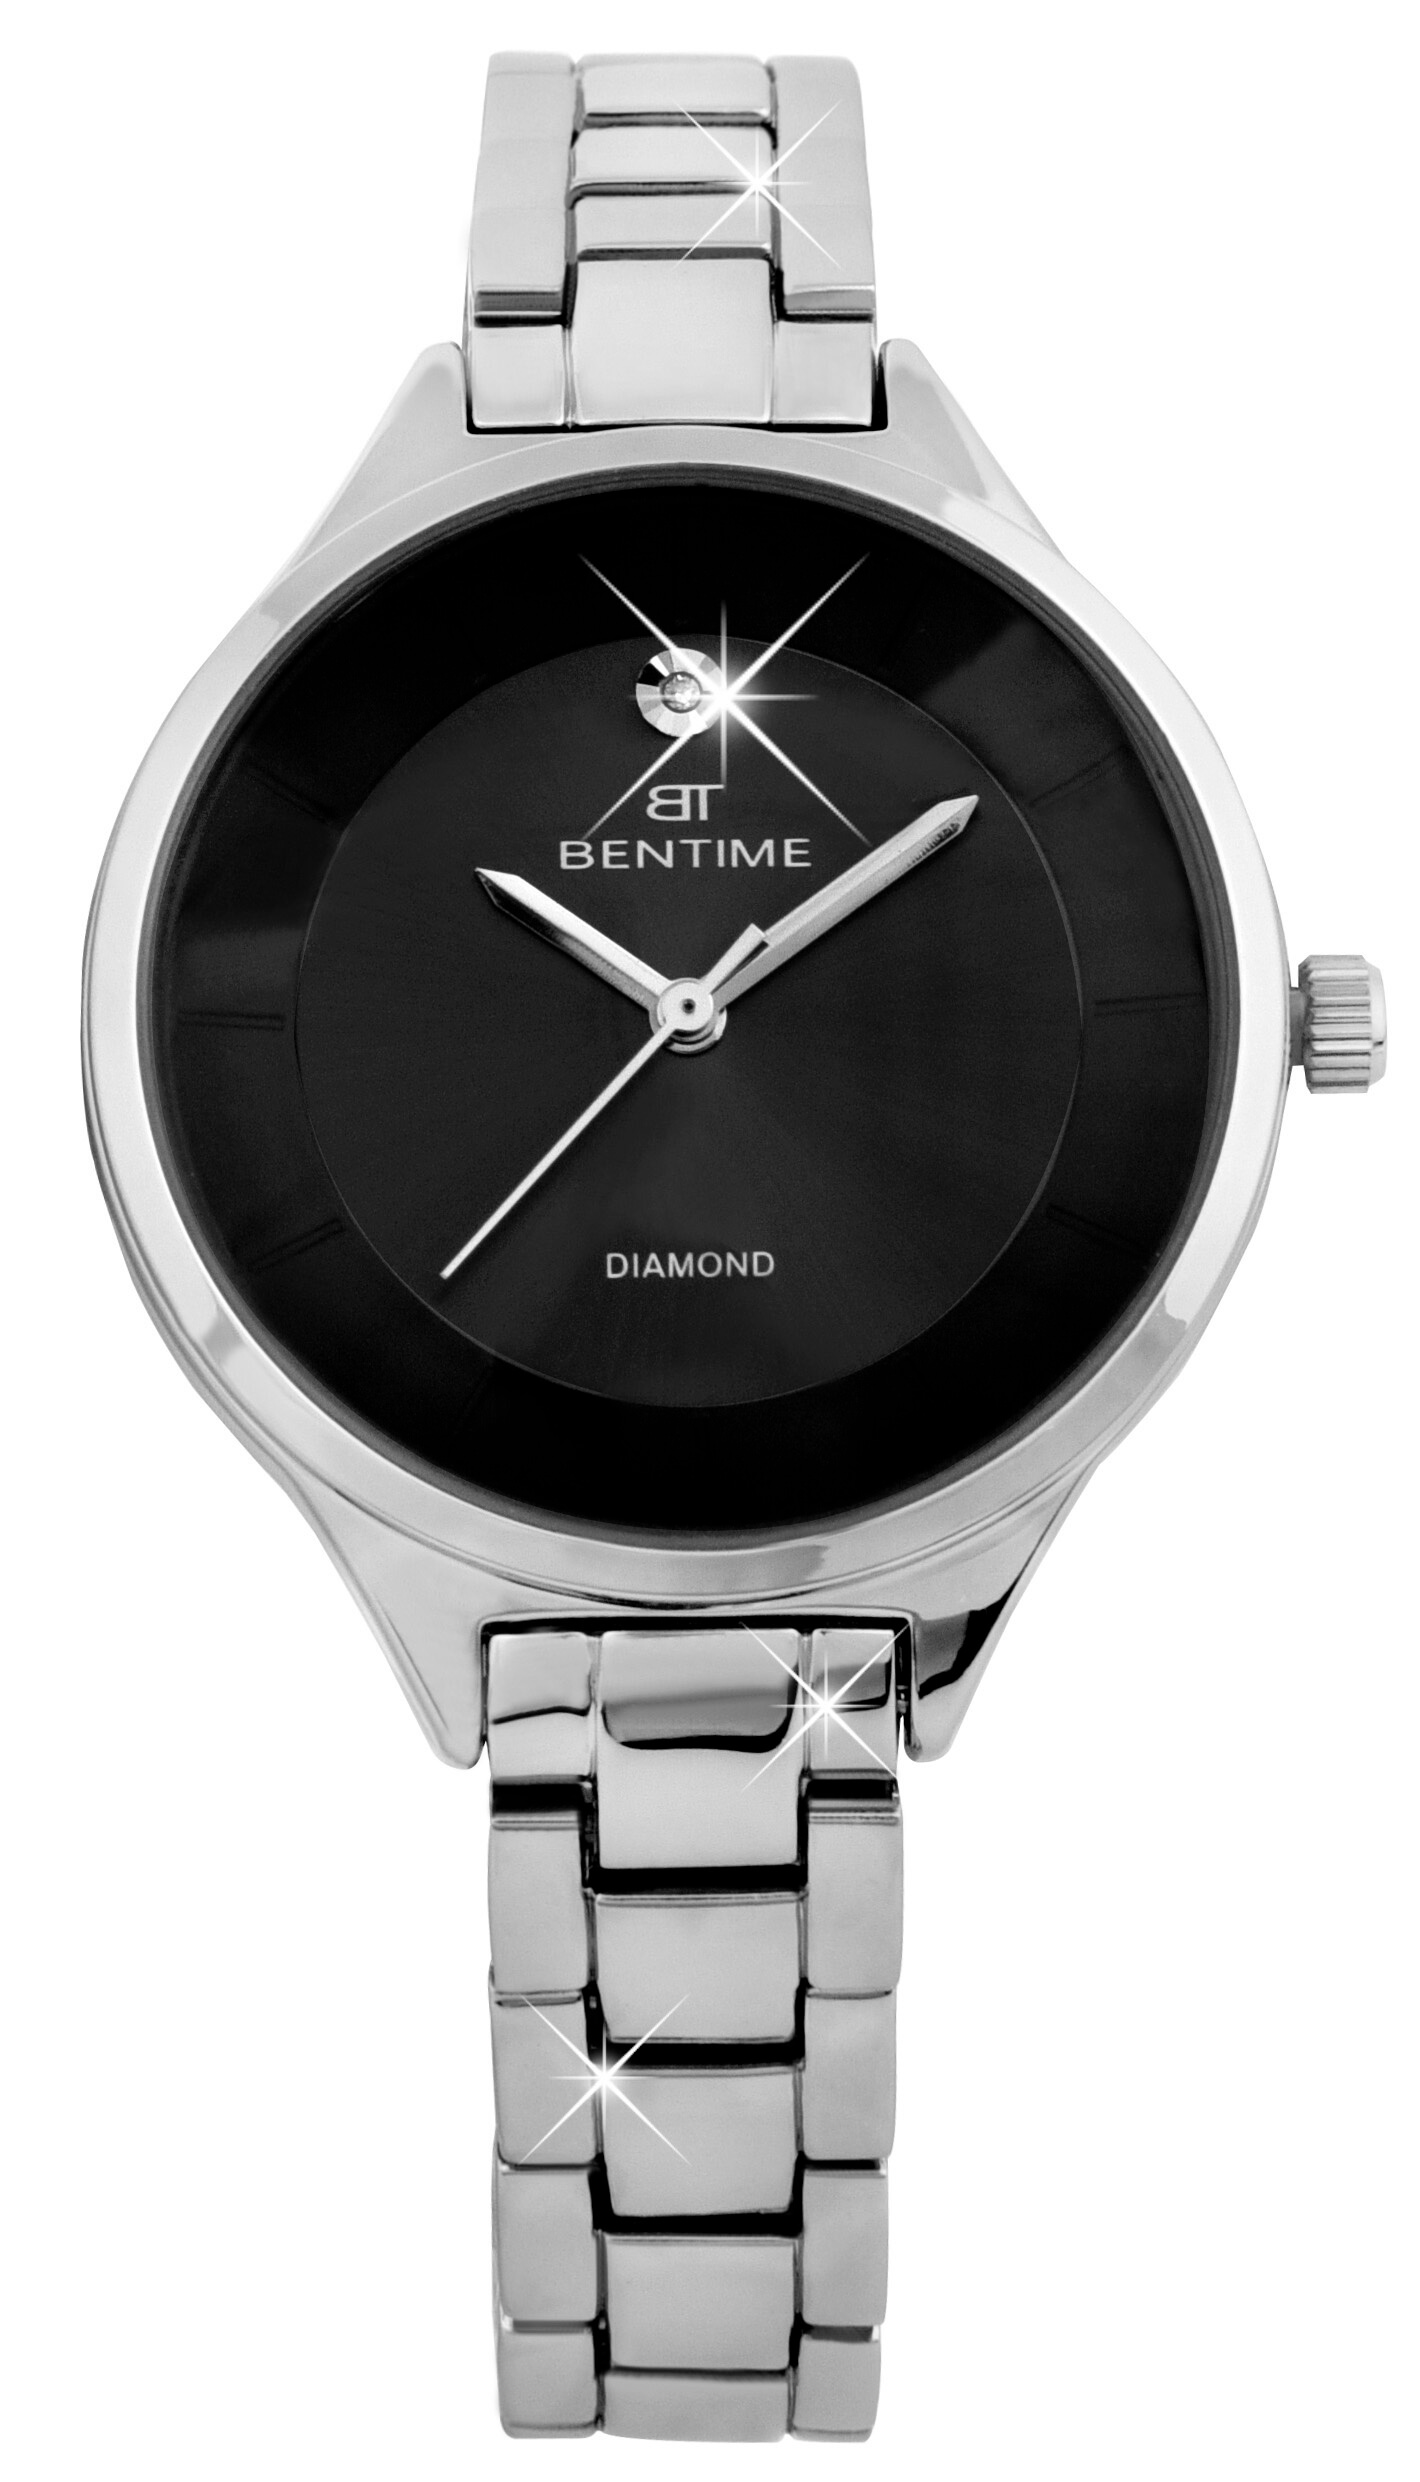 Bentime Dámské hodinky s diamantom 027-9MB-PT12102C Doprava a 1 rok ... 19ebe5c45f